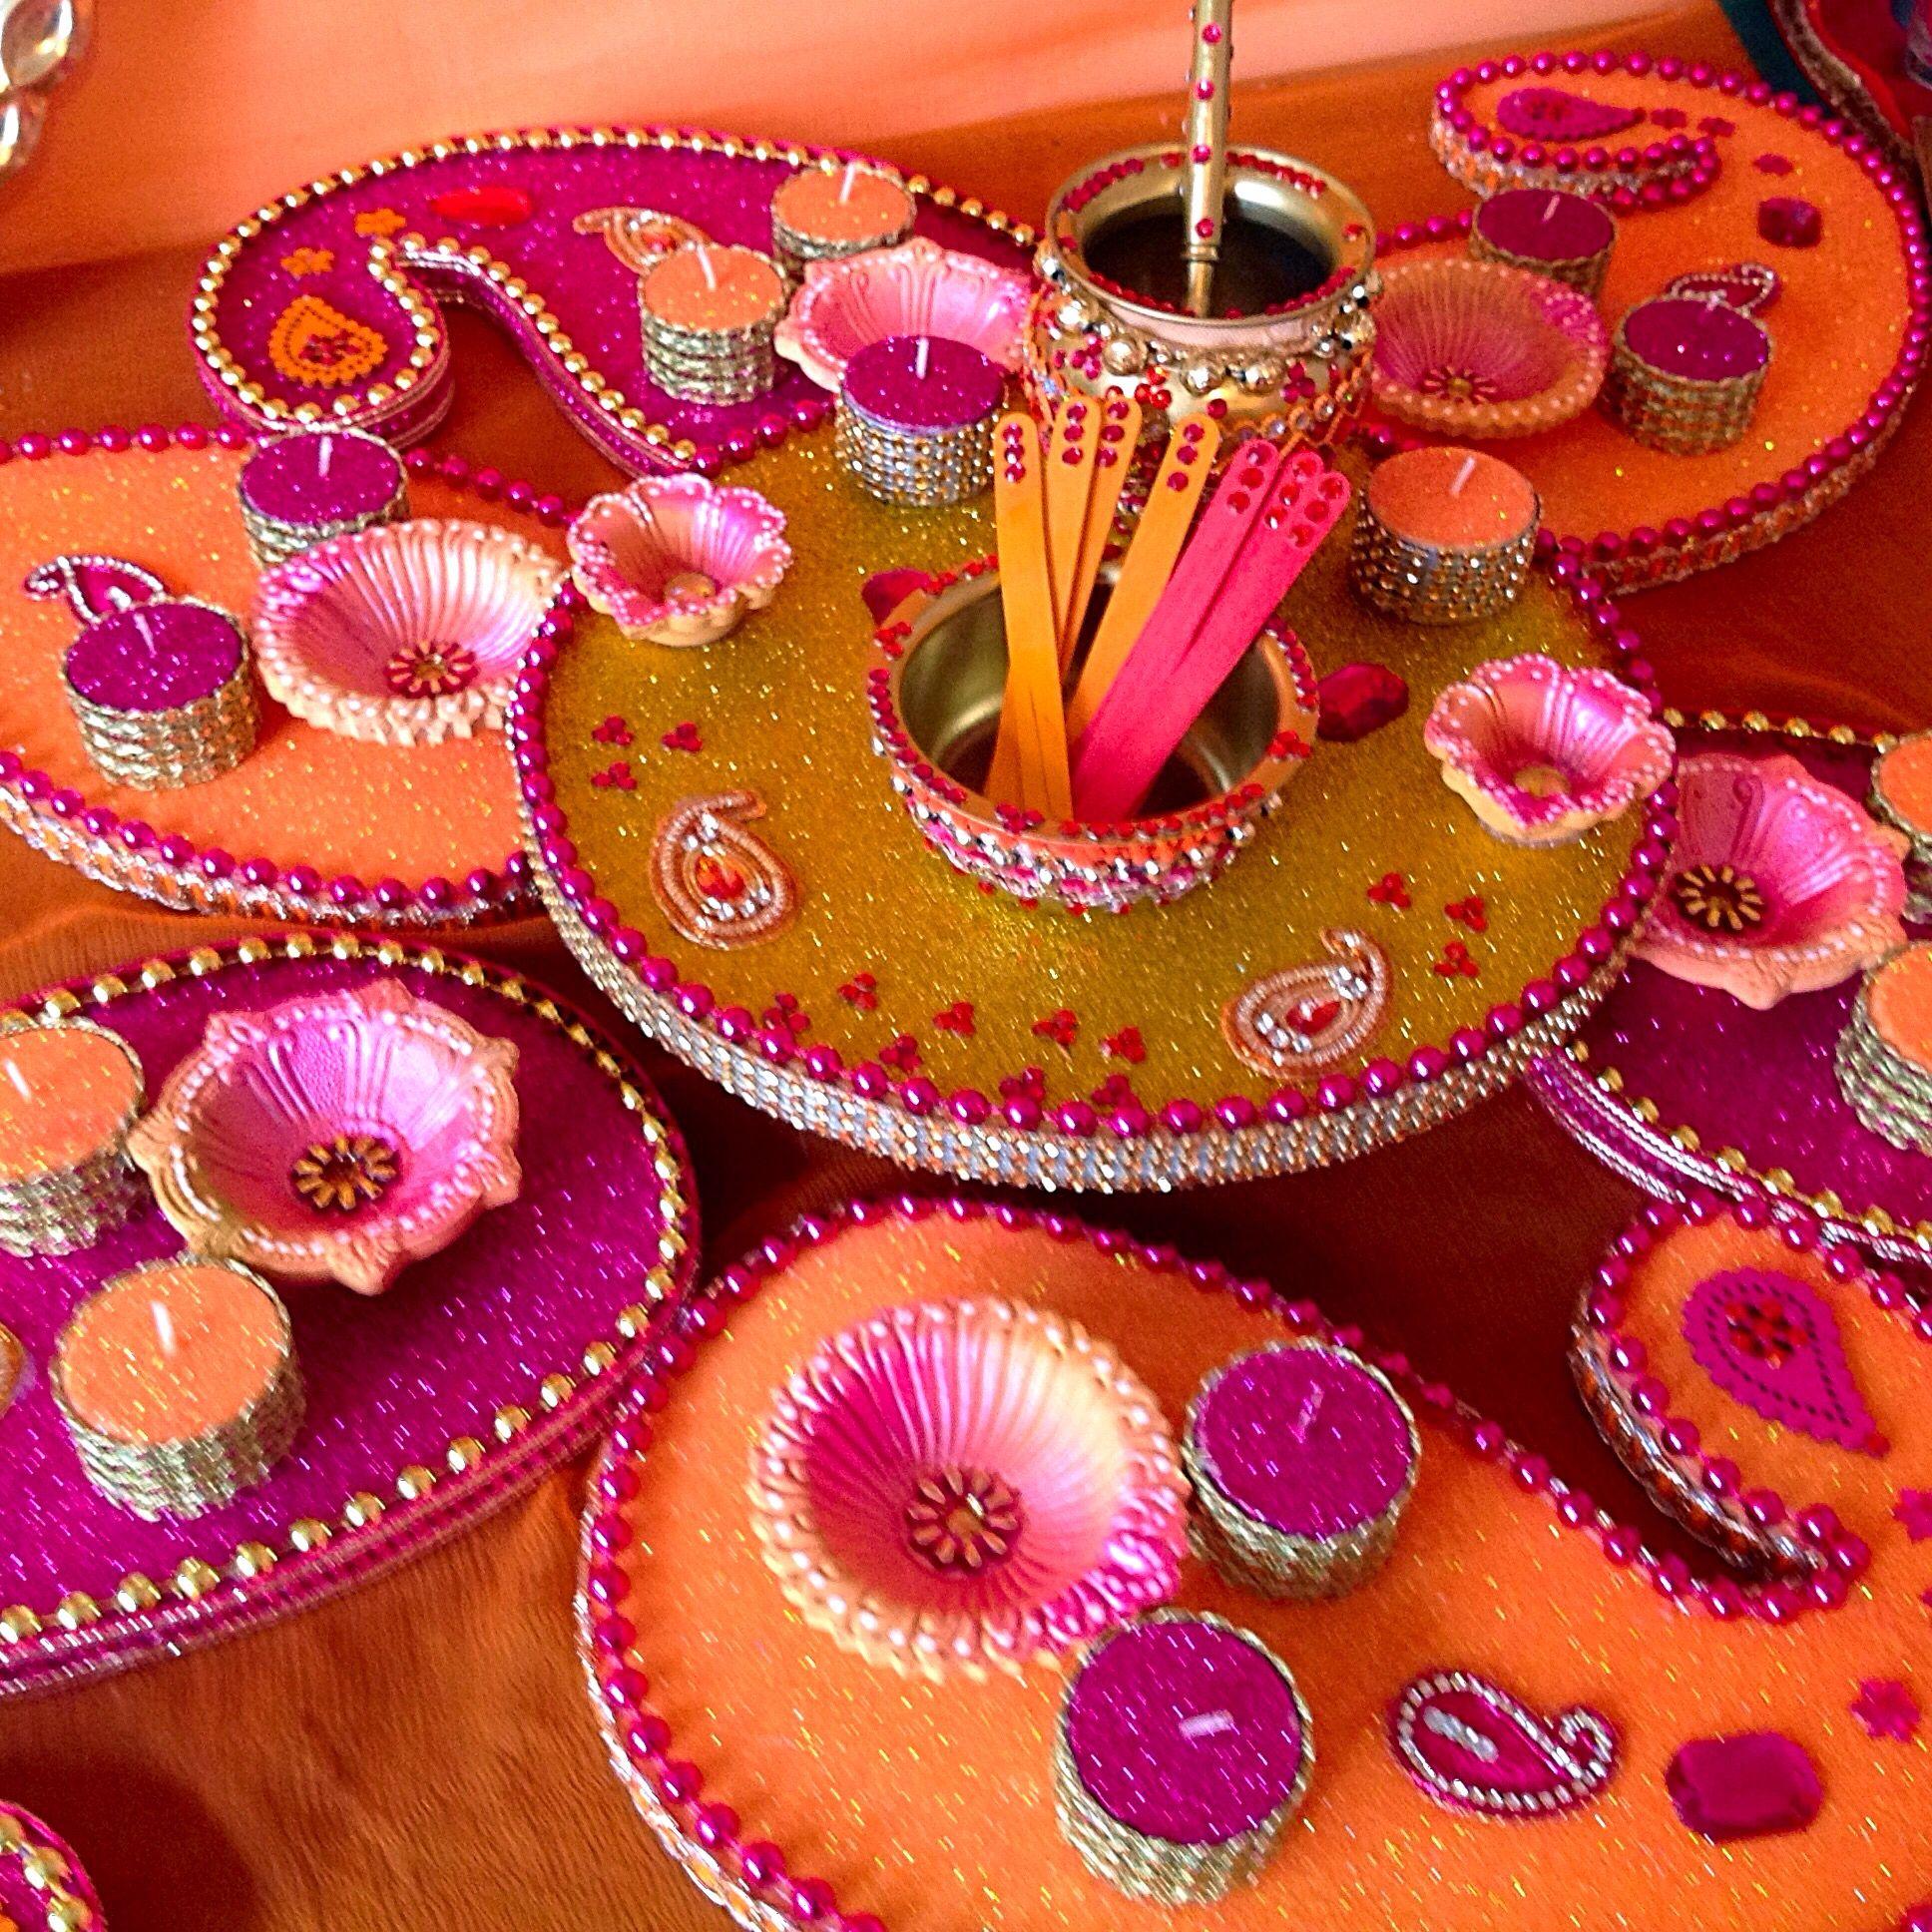 Beautiful pink and orange Mehndi plates with matching oil